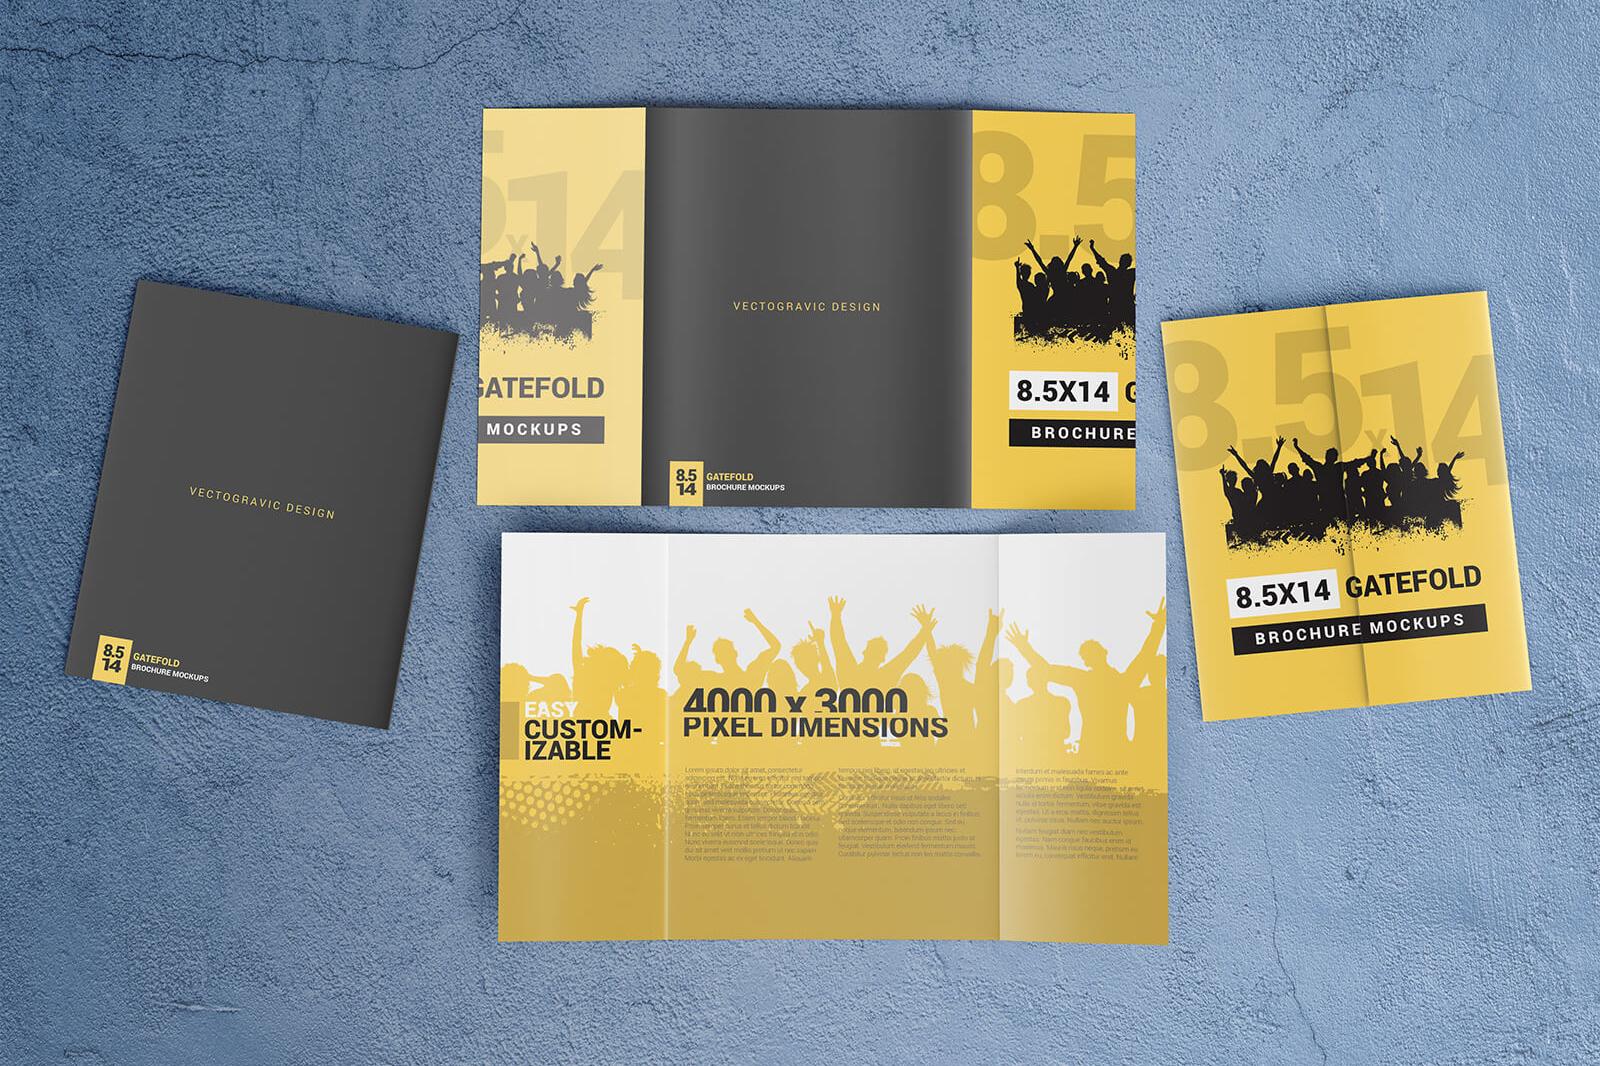 8 5u00d714 Gatefold Brochure Mockups